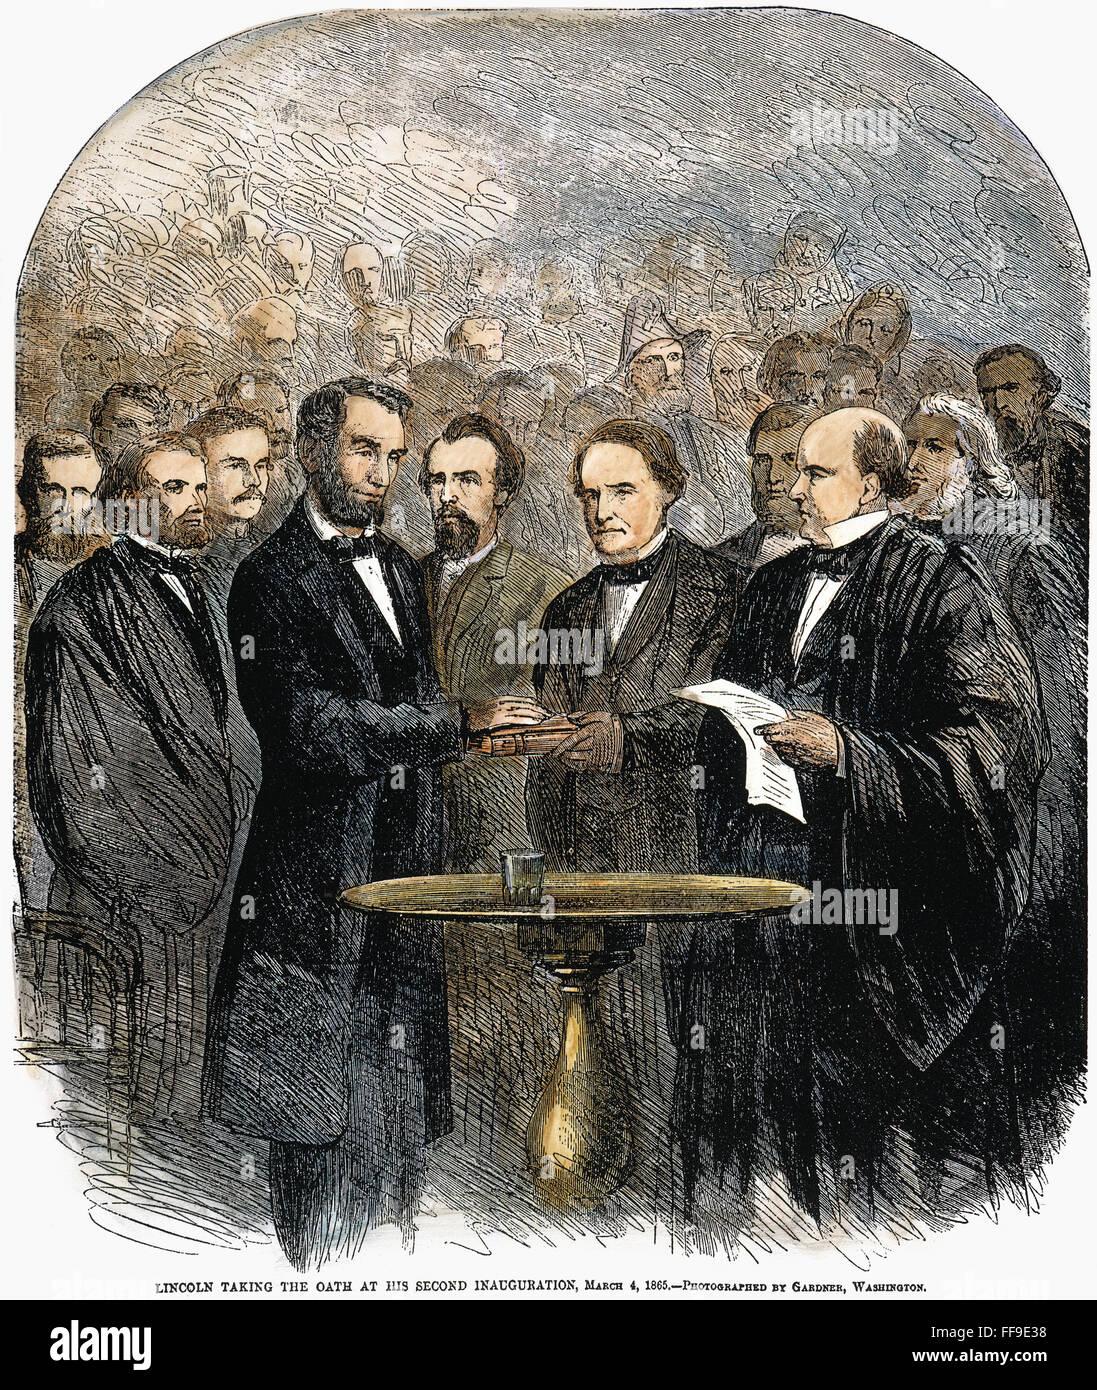 president lincolns speech - 620×721